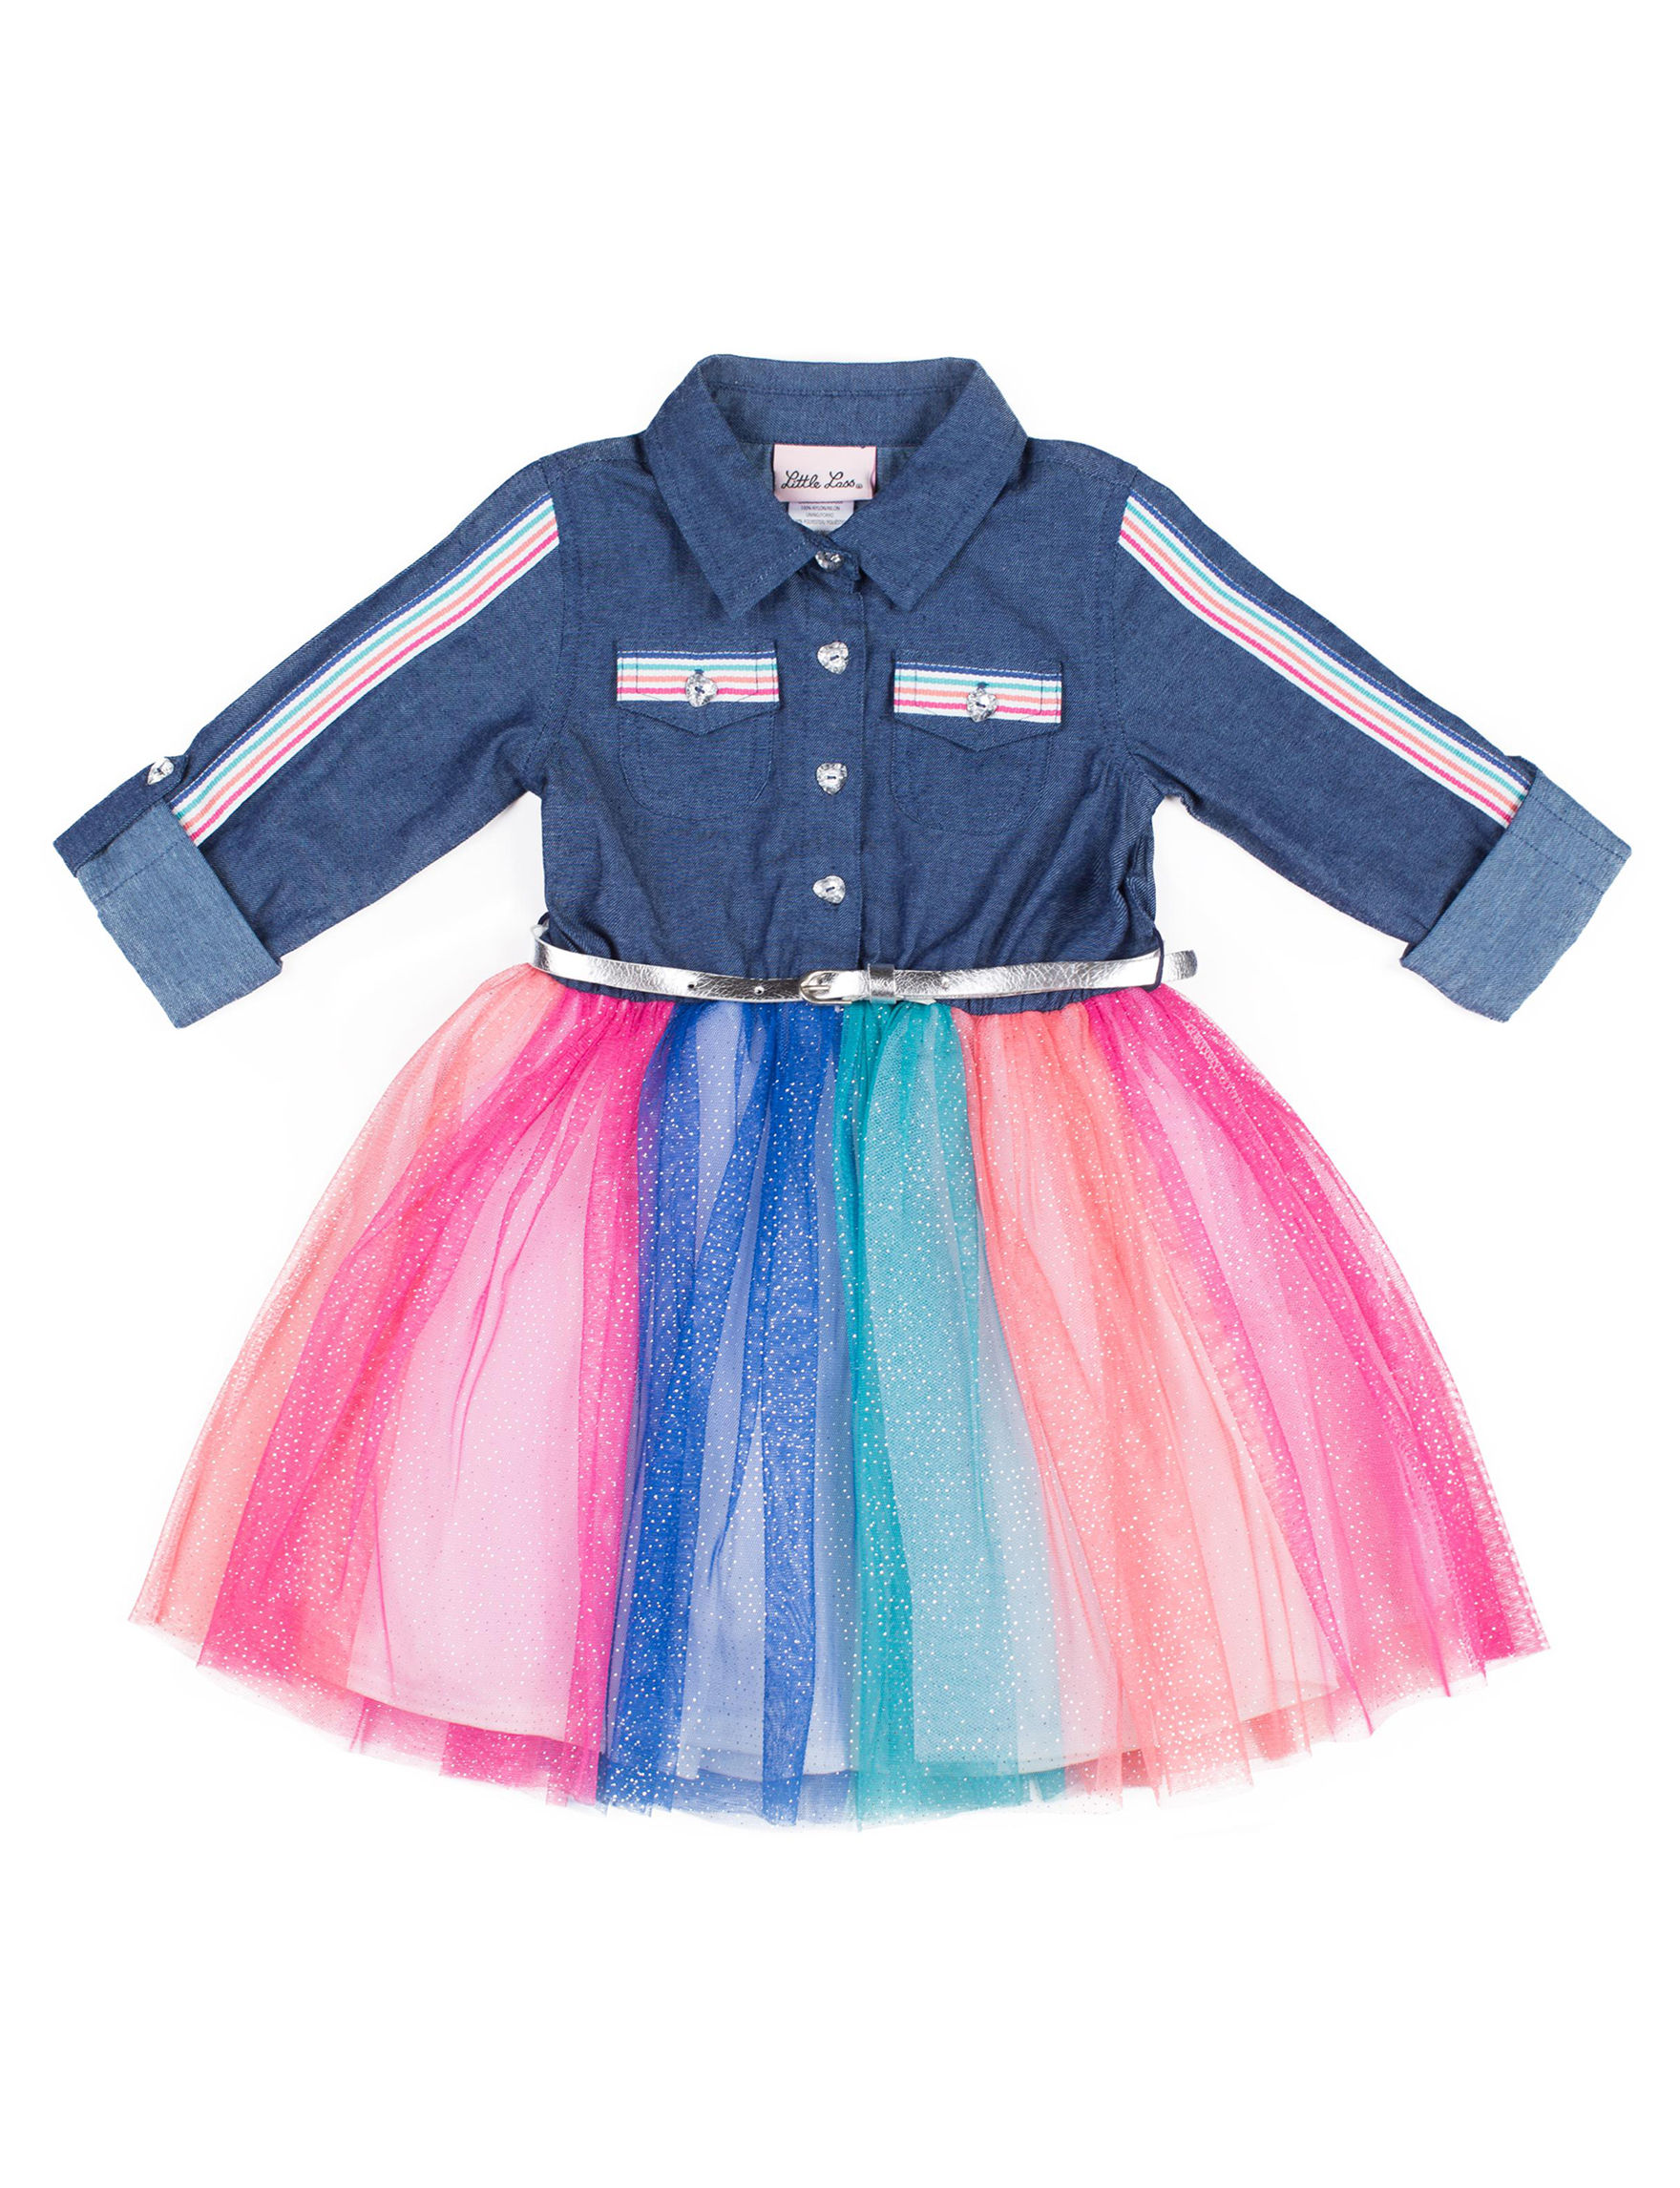 Little Lass Denim / Rainbow